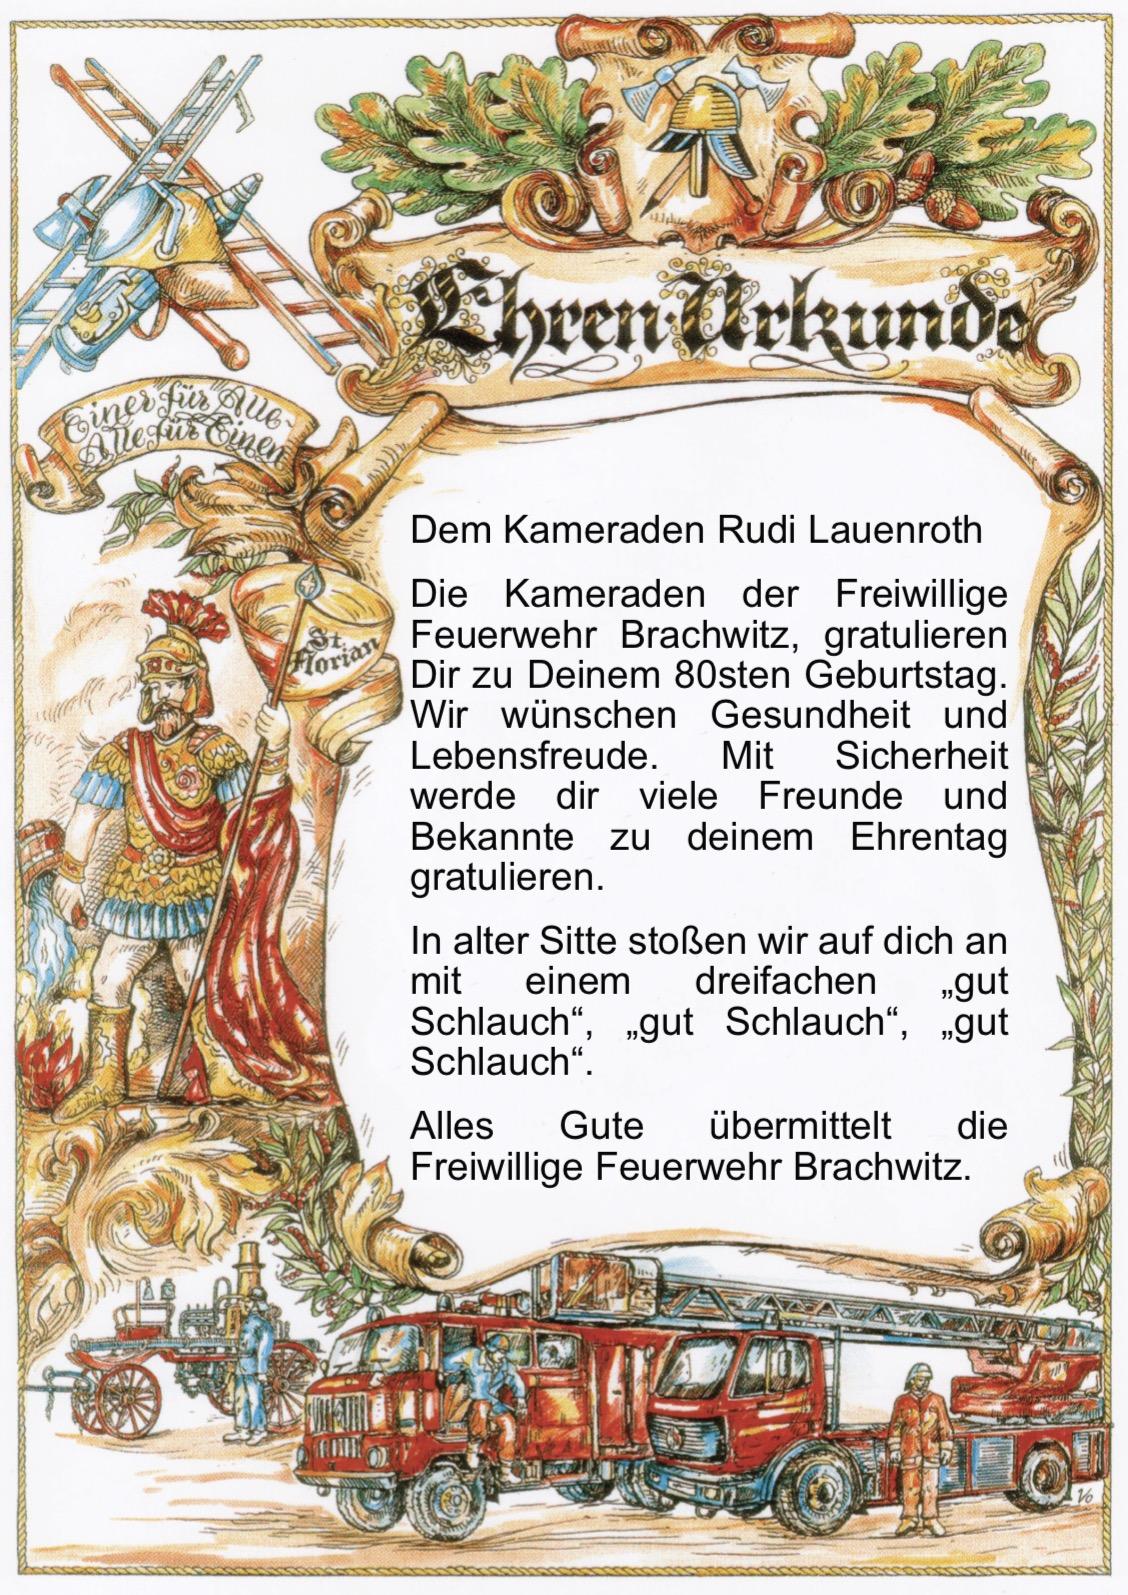 Rudi Lautenroth